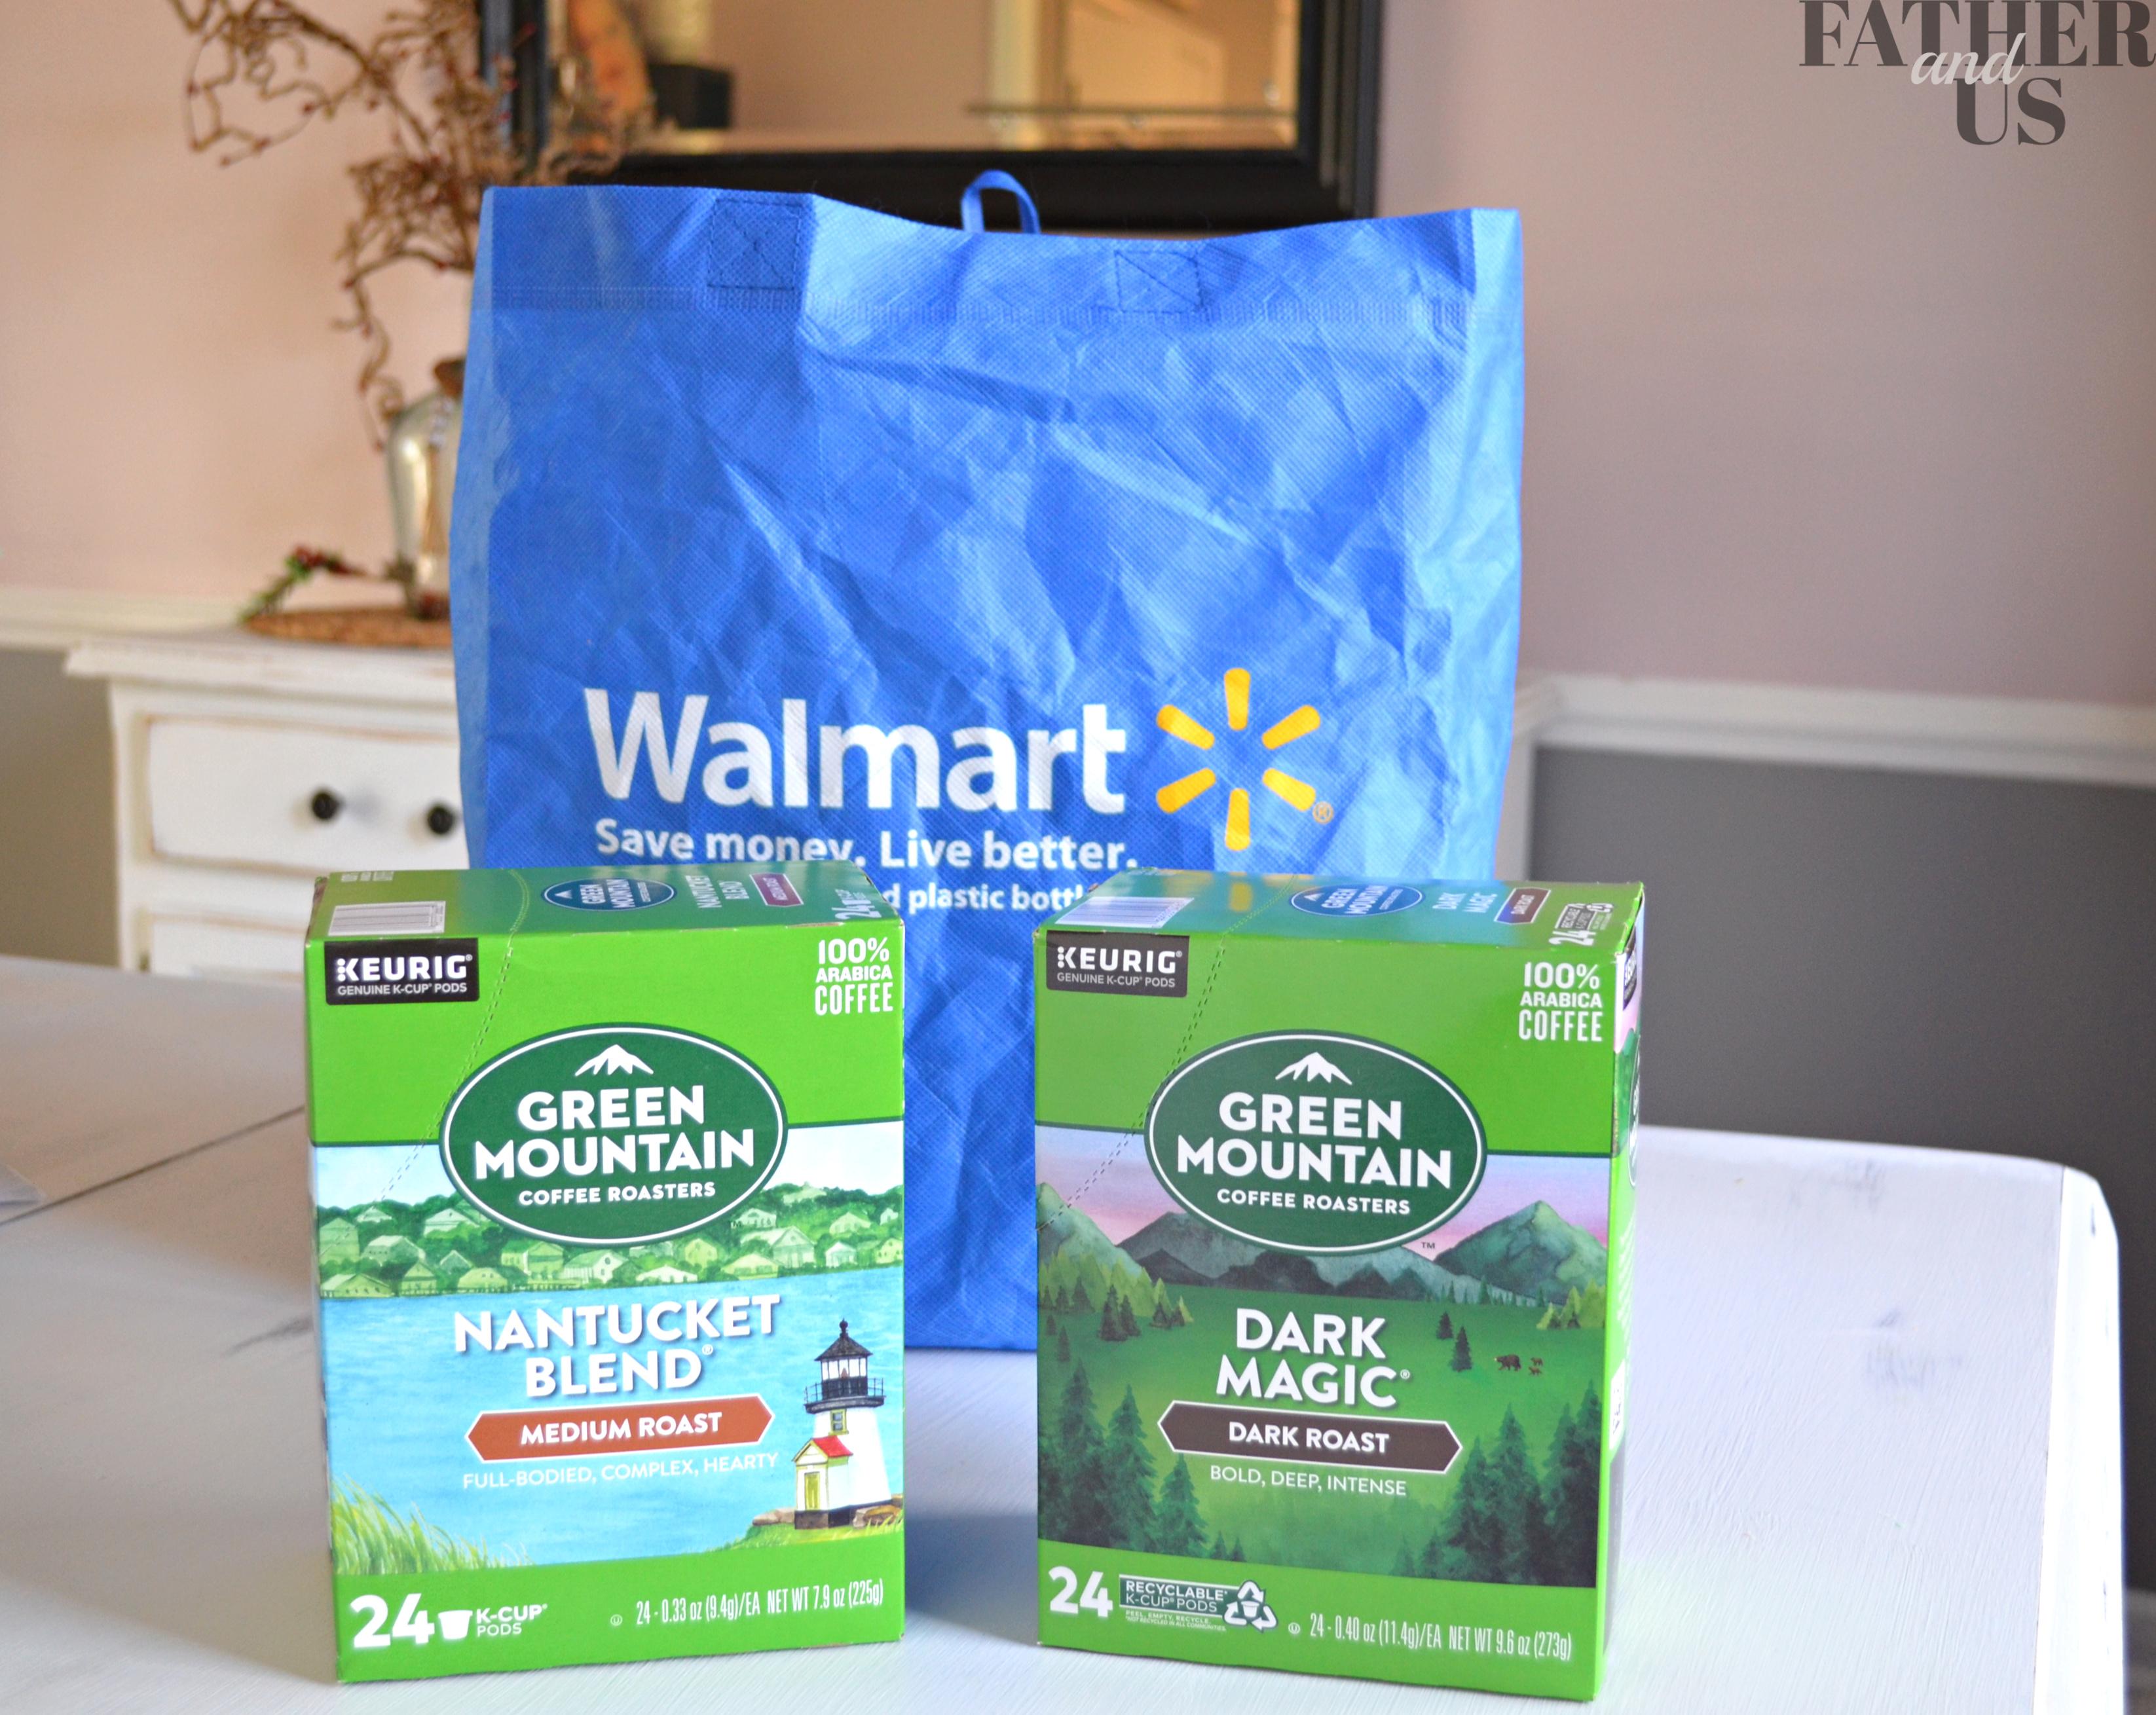 Green Mountain Coffee and Walmart Bag